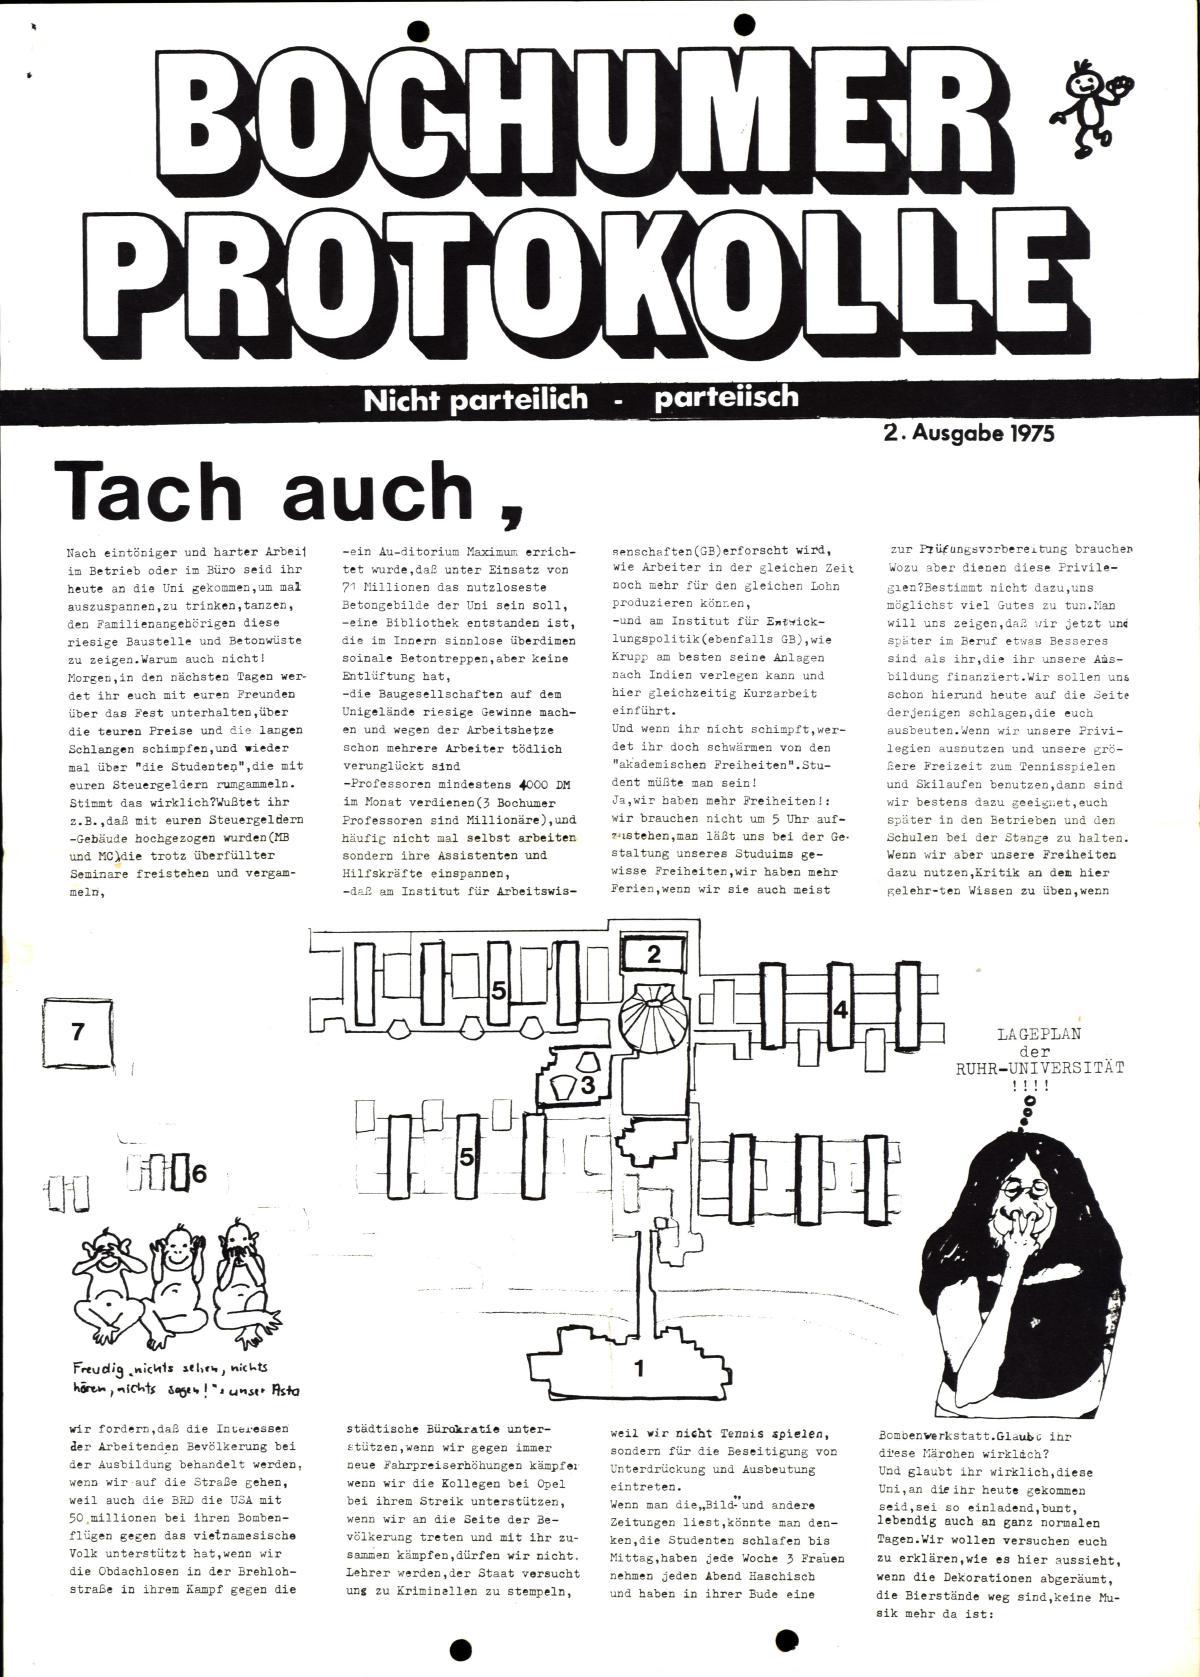 Bochumer_Protokolle_19750500_001